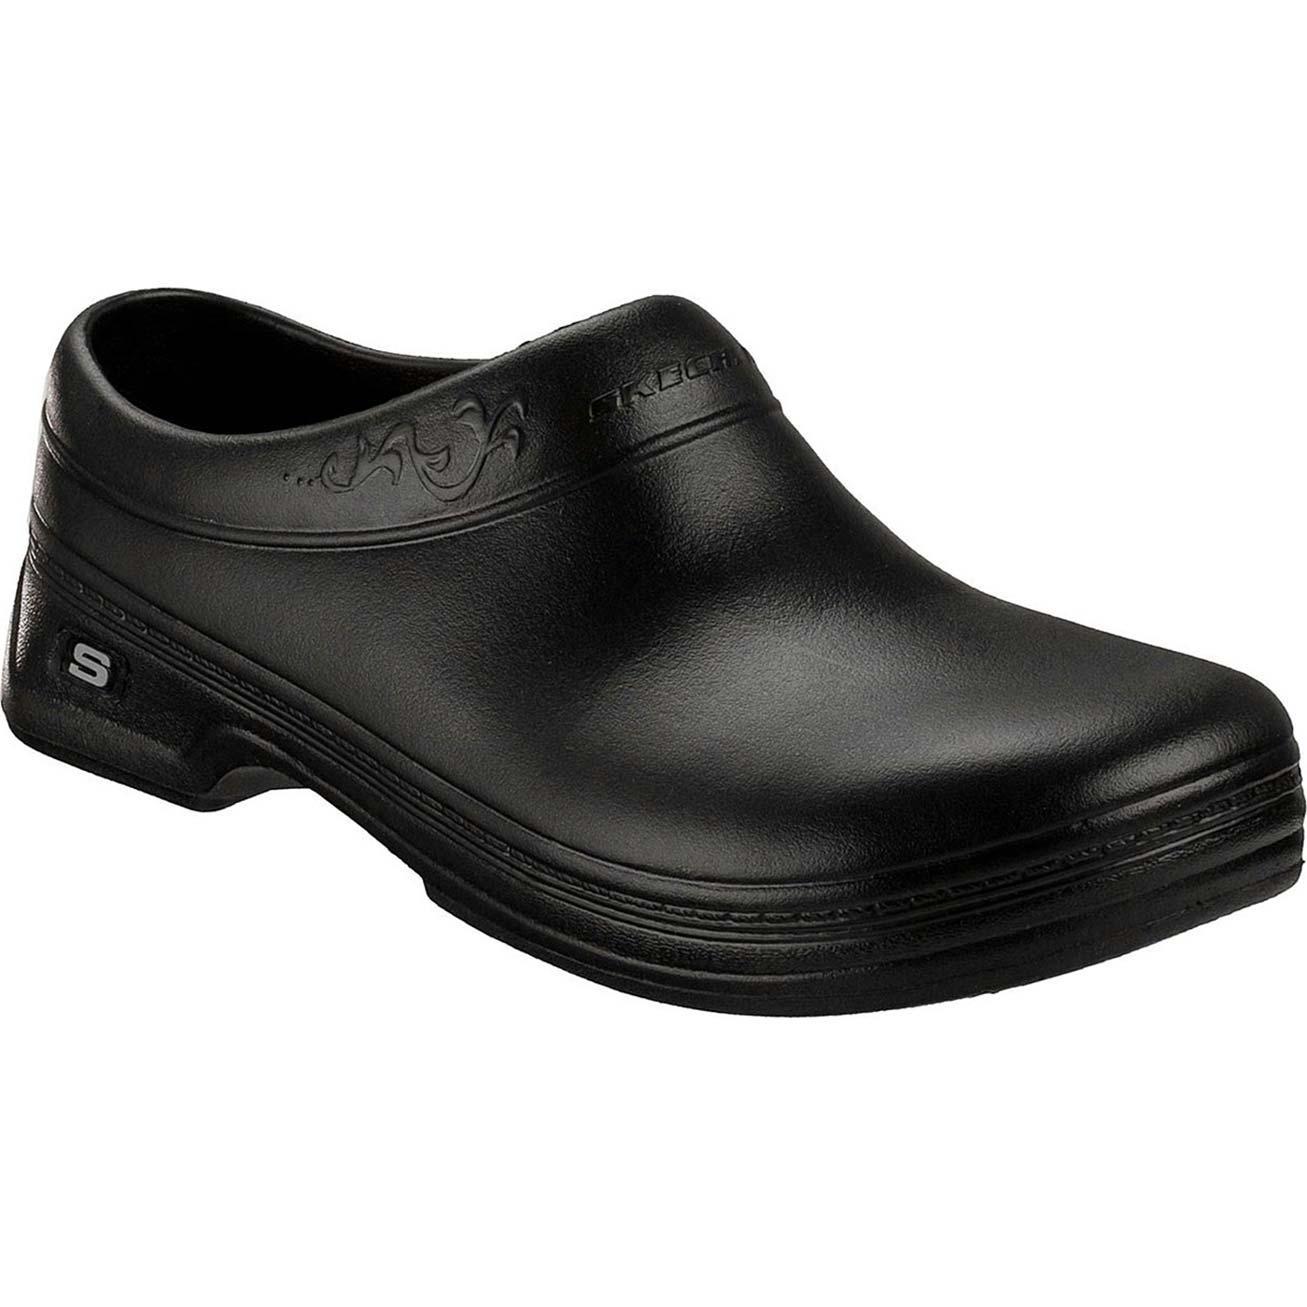 cheap order sale best sale Skechers Work Women's Oswald Clara Shoes outlet newest d90BUPv7